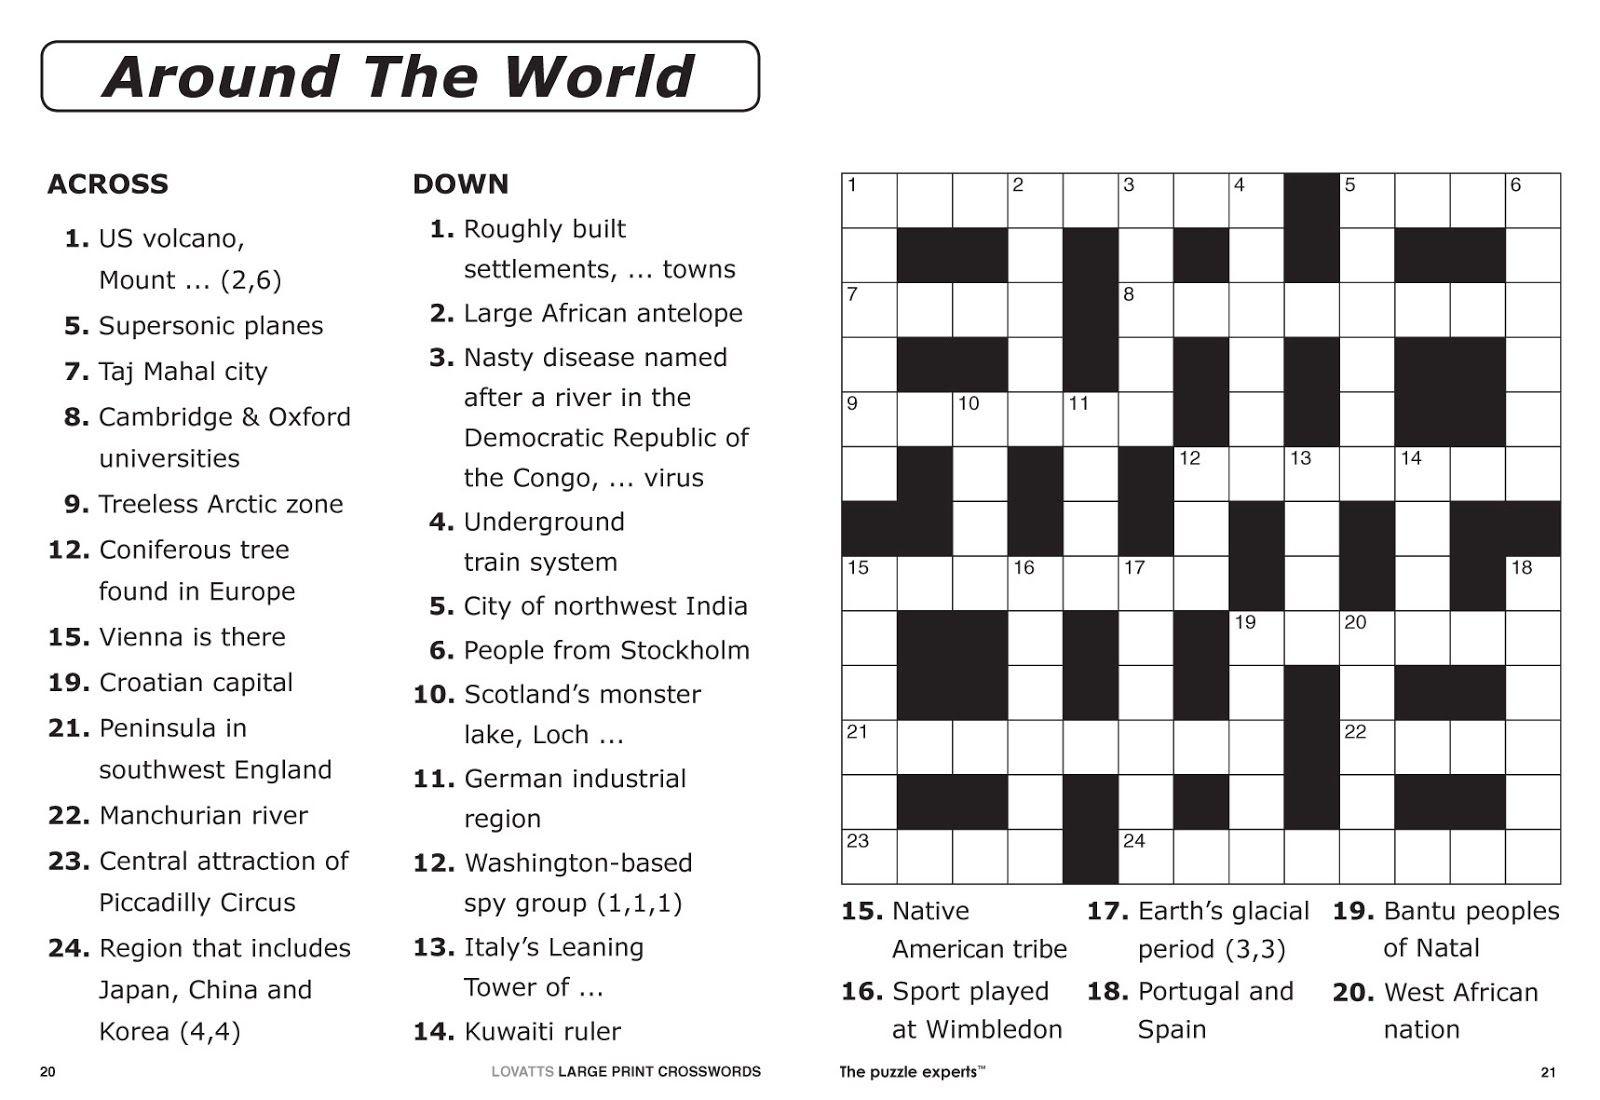 Free Printable Large Print Crossword Puzzles | M3U8 - Printable Crosswords For 5 Year Olds